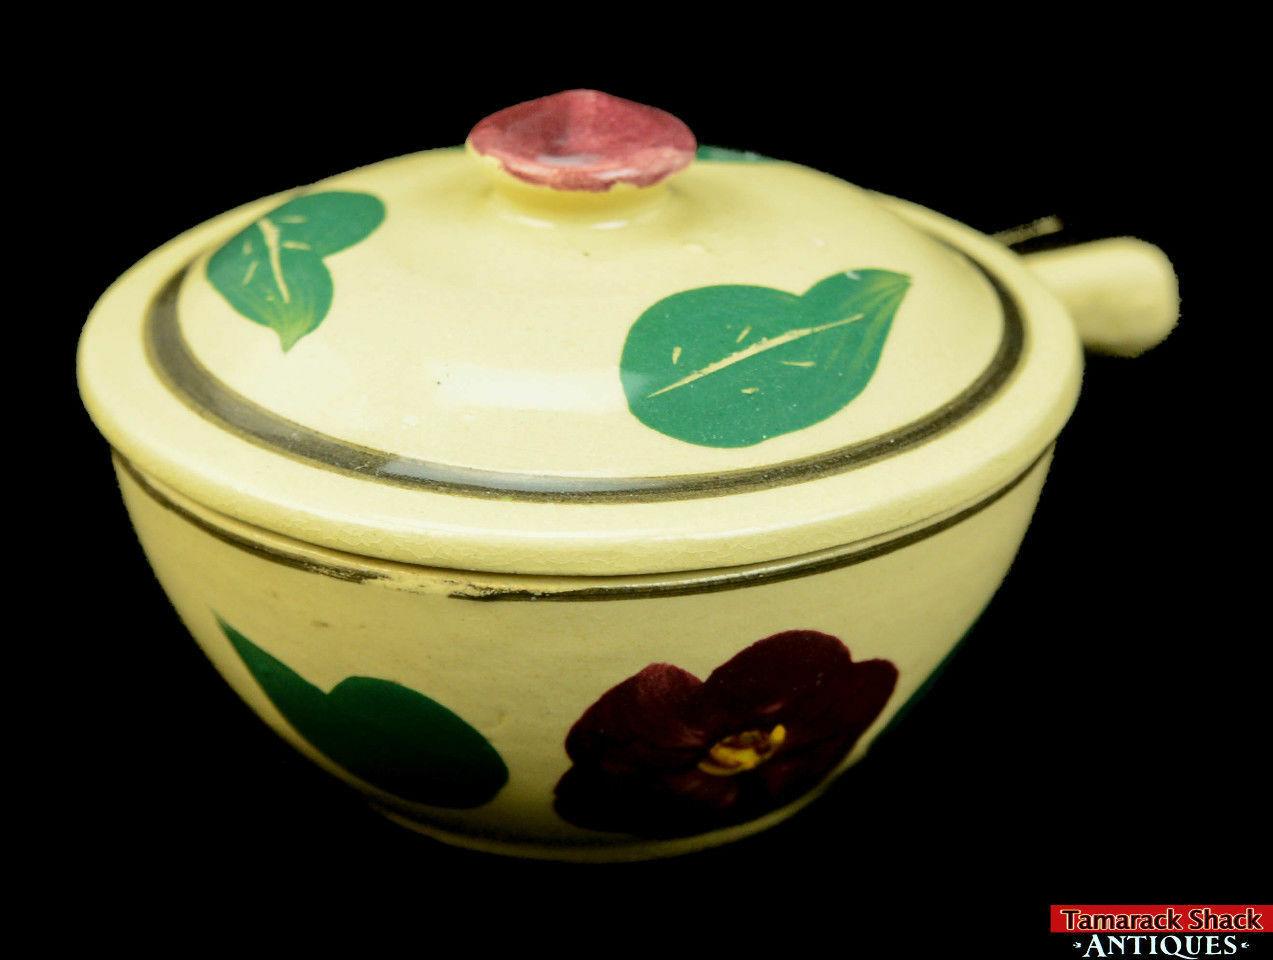 Watt-Pottery-Yellow-Ware-Individual-Covered-Stick-Casserole-Lid-Rio-Rose-VTG-L5Y-361680190681-4.jpg